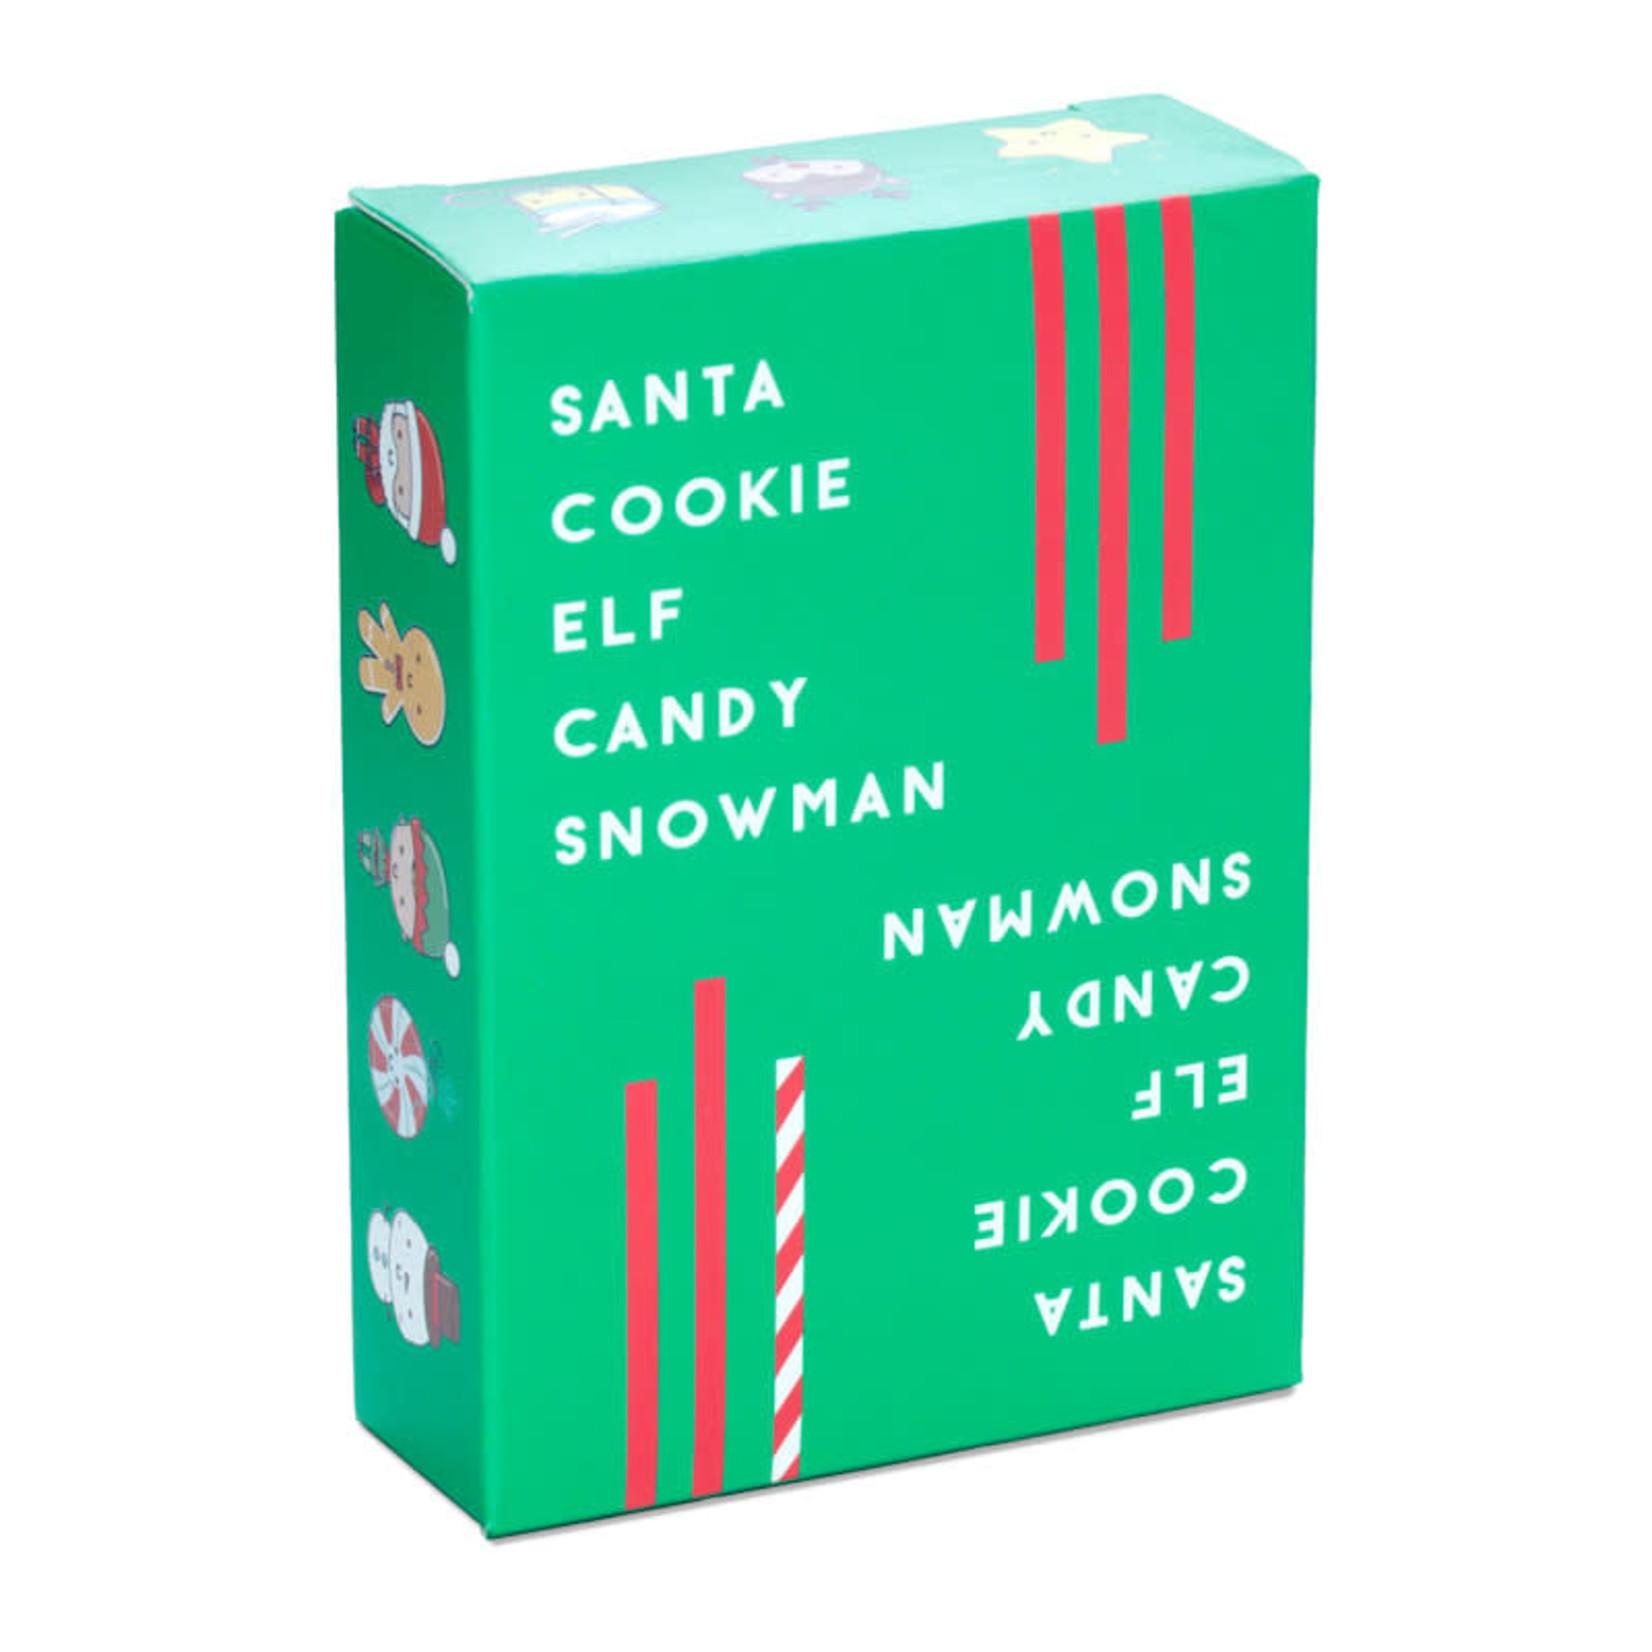 Dolphin Hat Games Santa Cookie Elf Candy Snowman